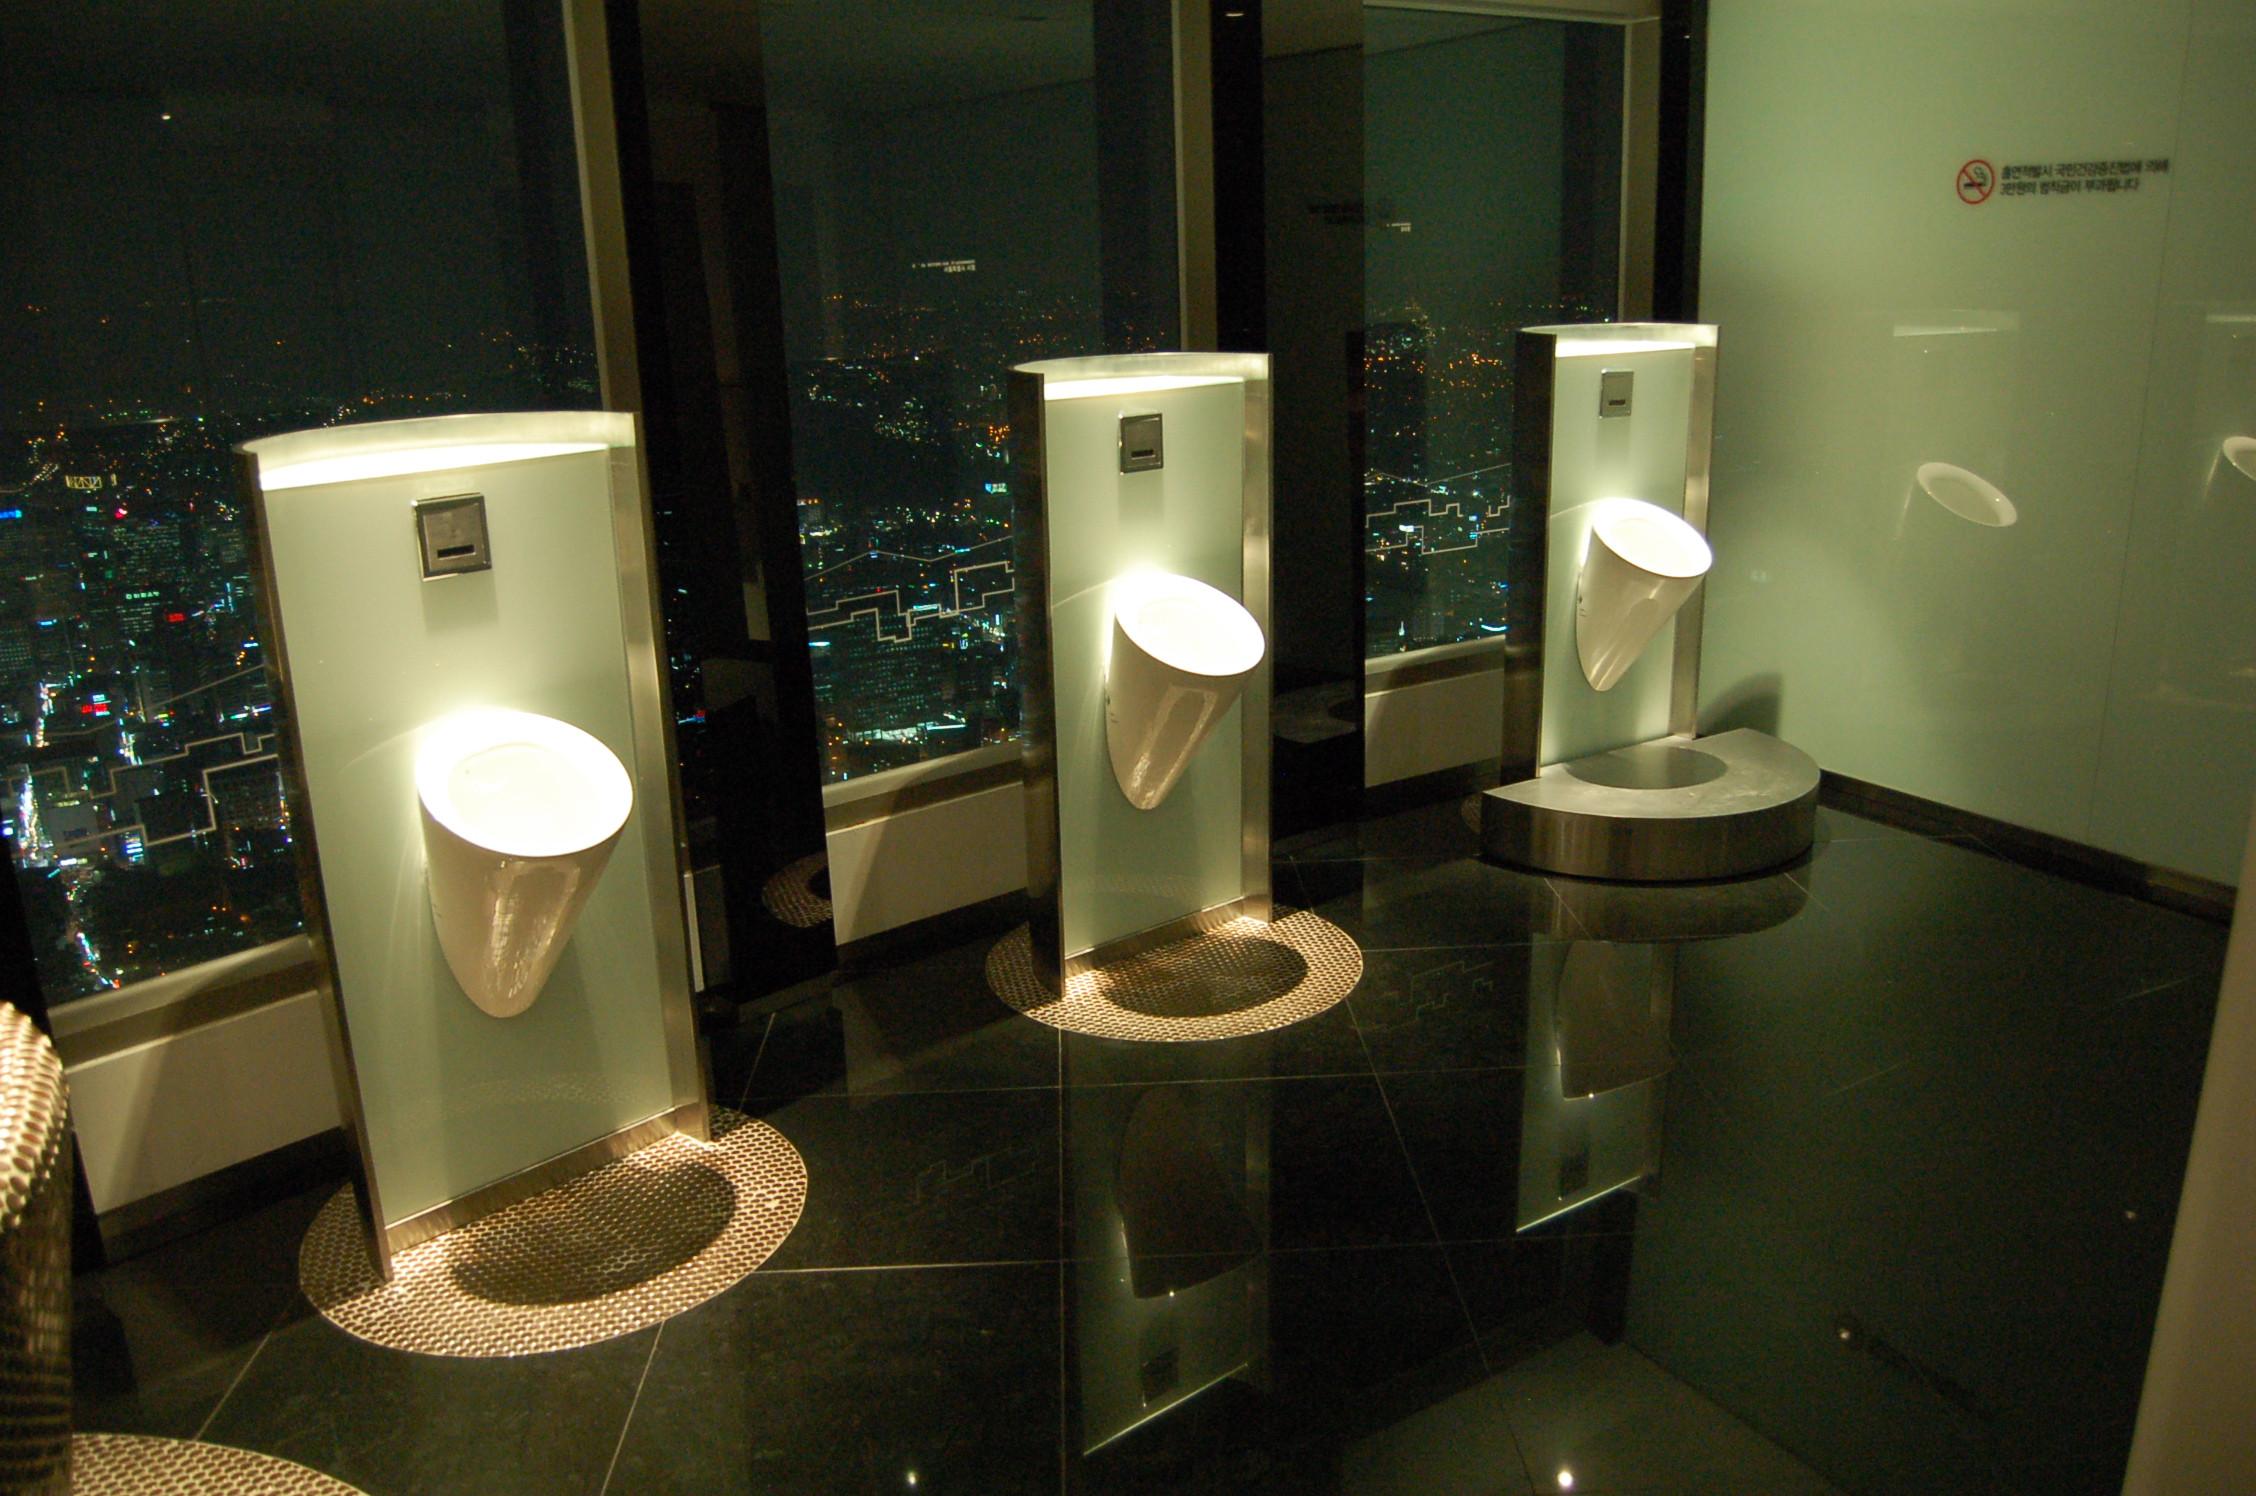 Фото из мужского туалета 16 фотография